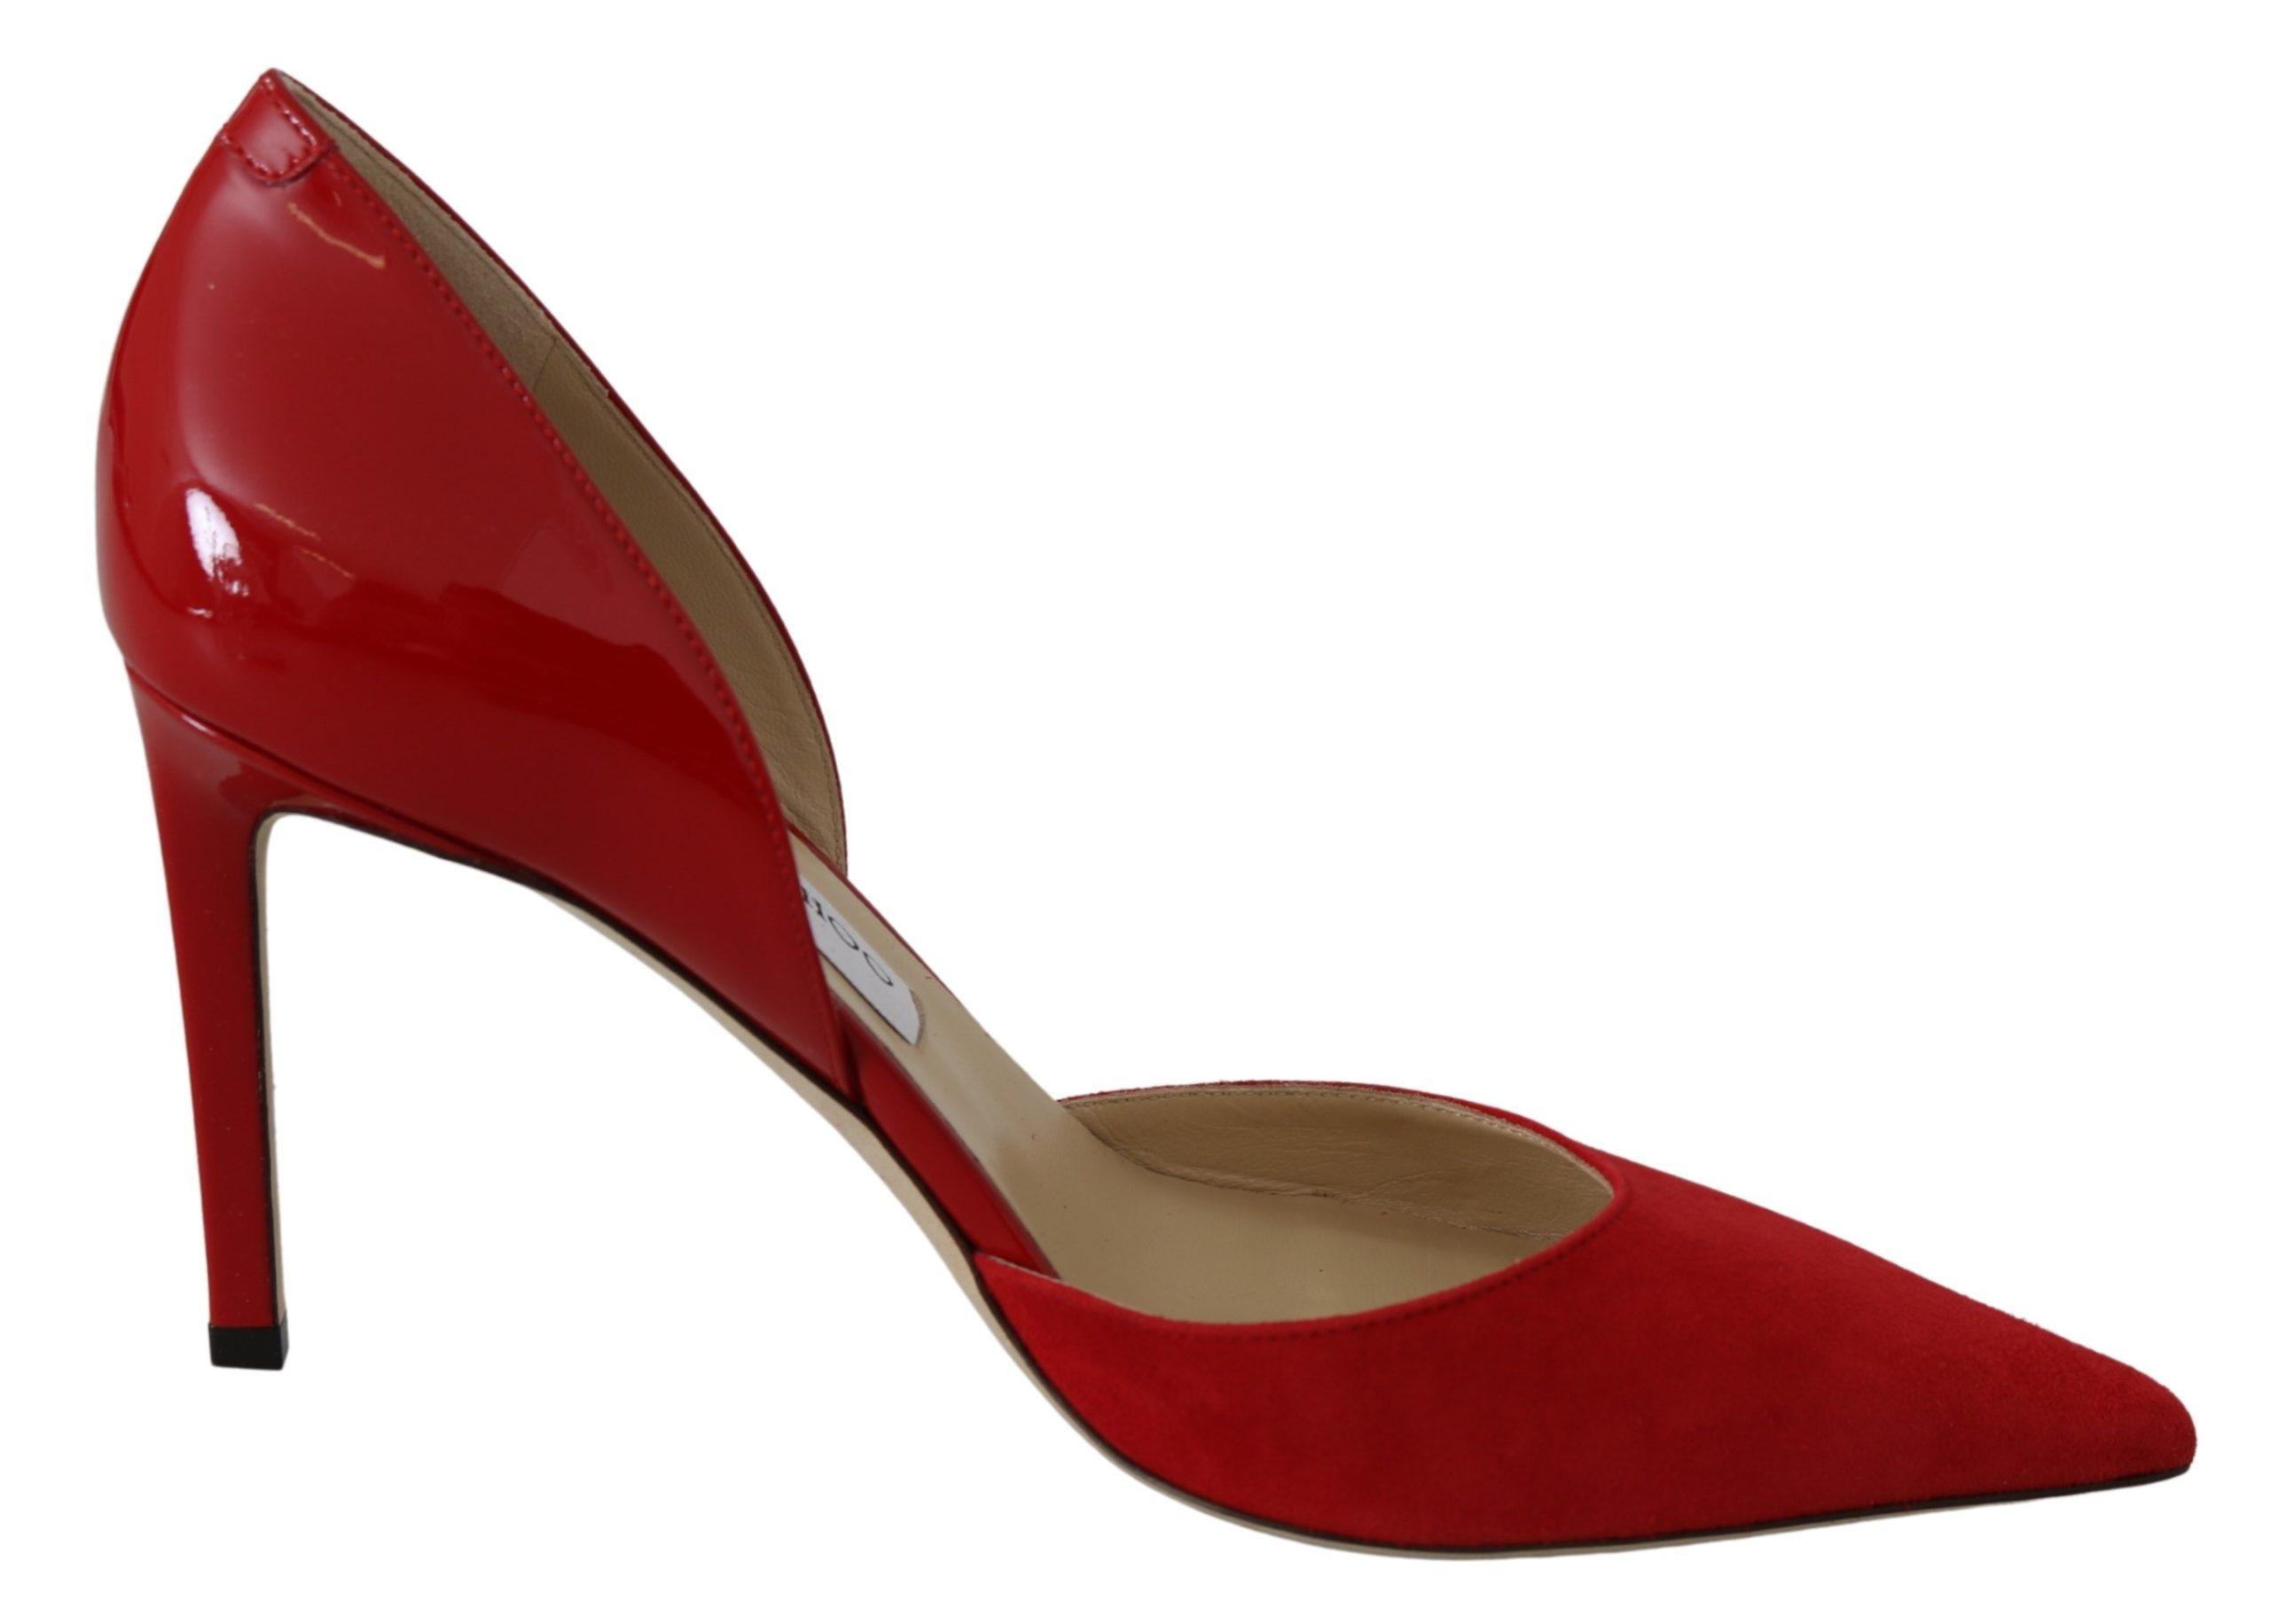 Jimmy Choo Women's Darylin 85 Heels Shoes Red 194611094388 - EU38.5/US8.5